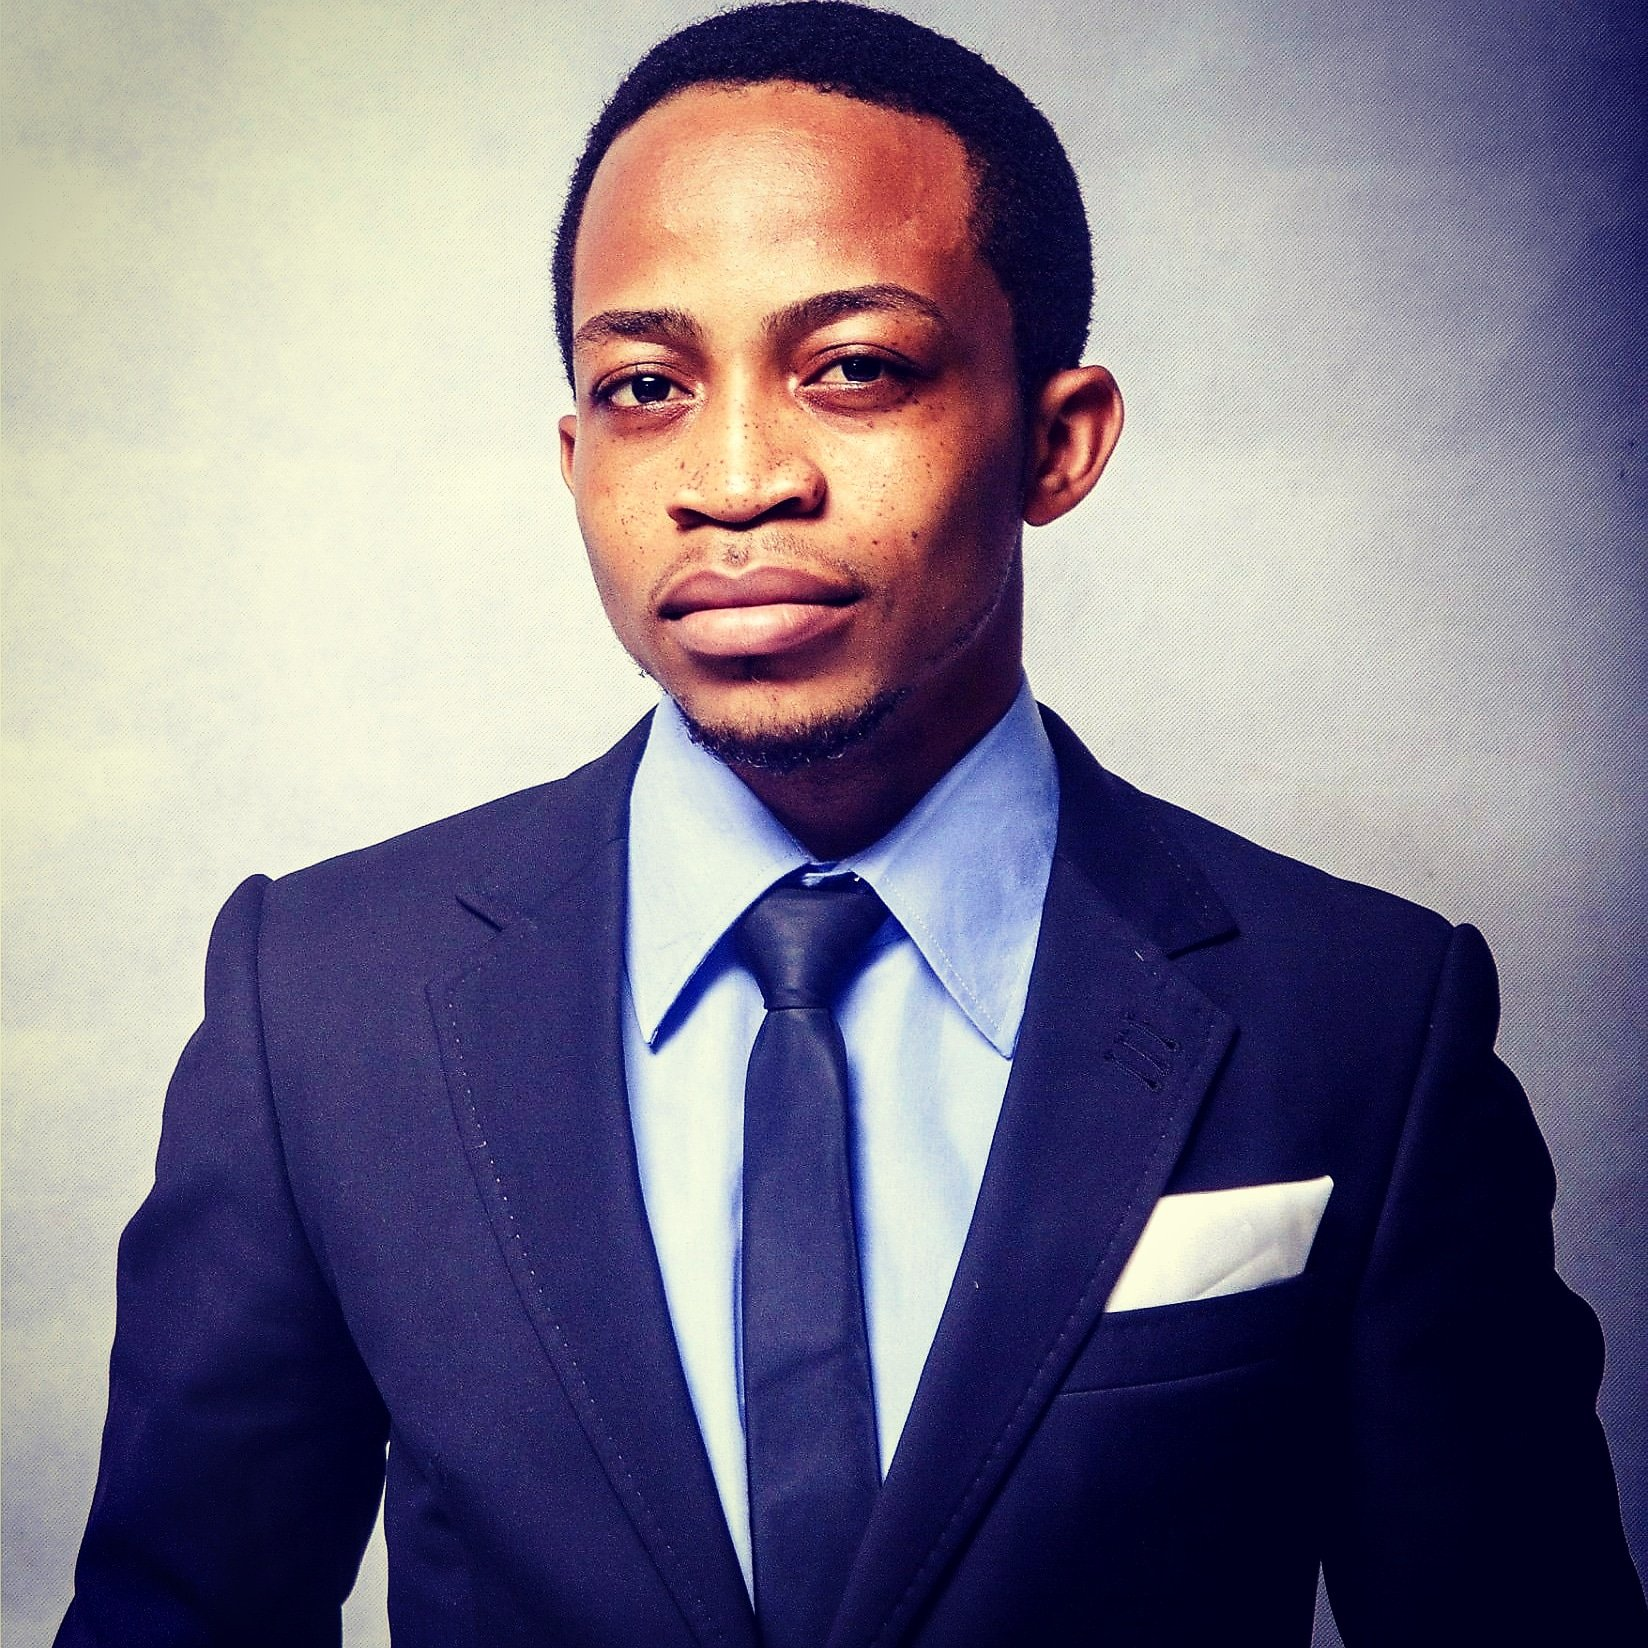 Emeka Nwarulor